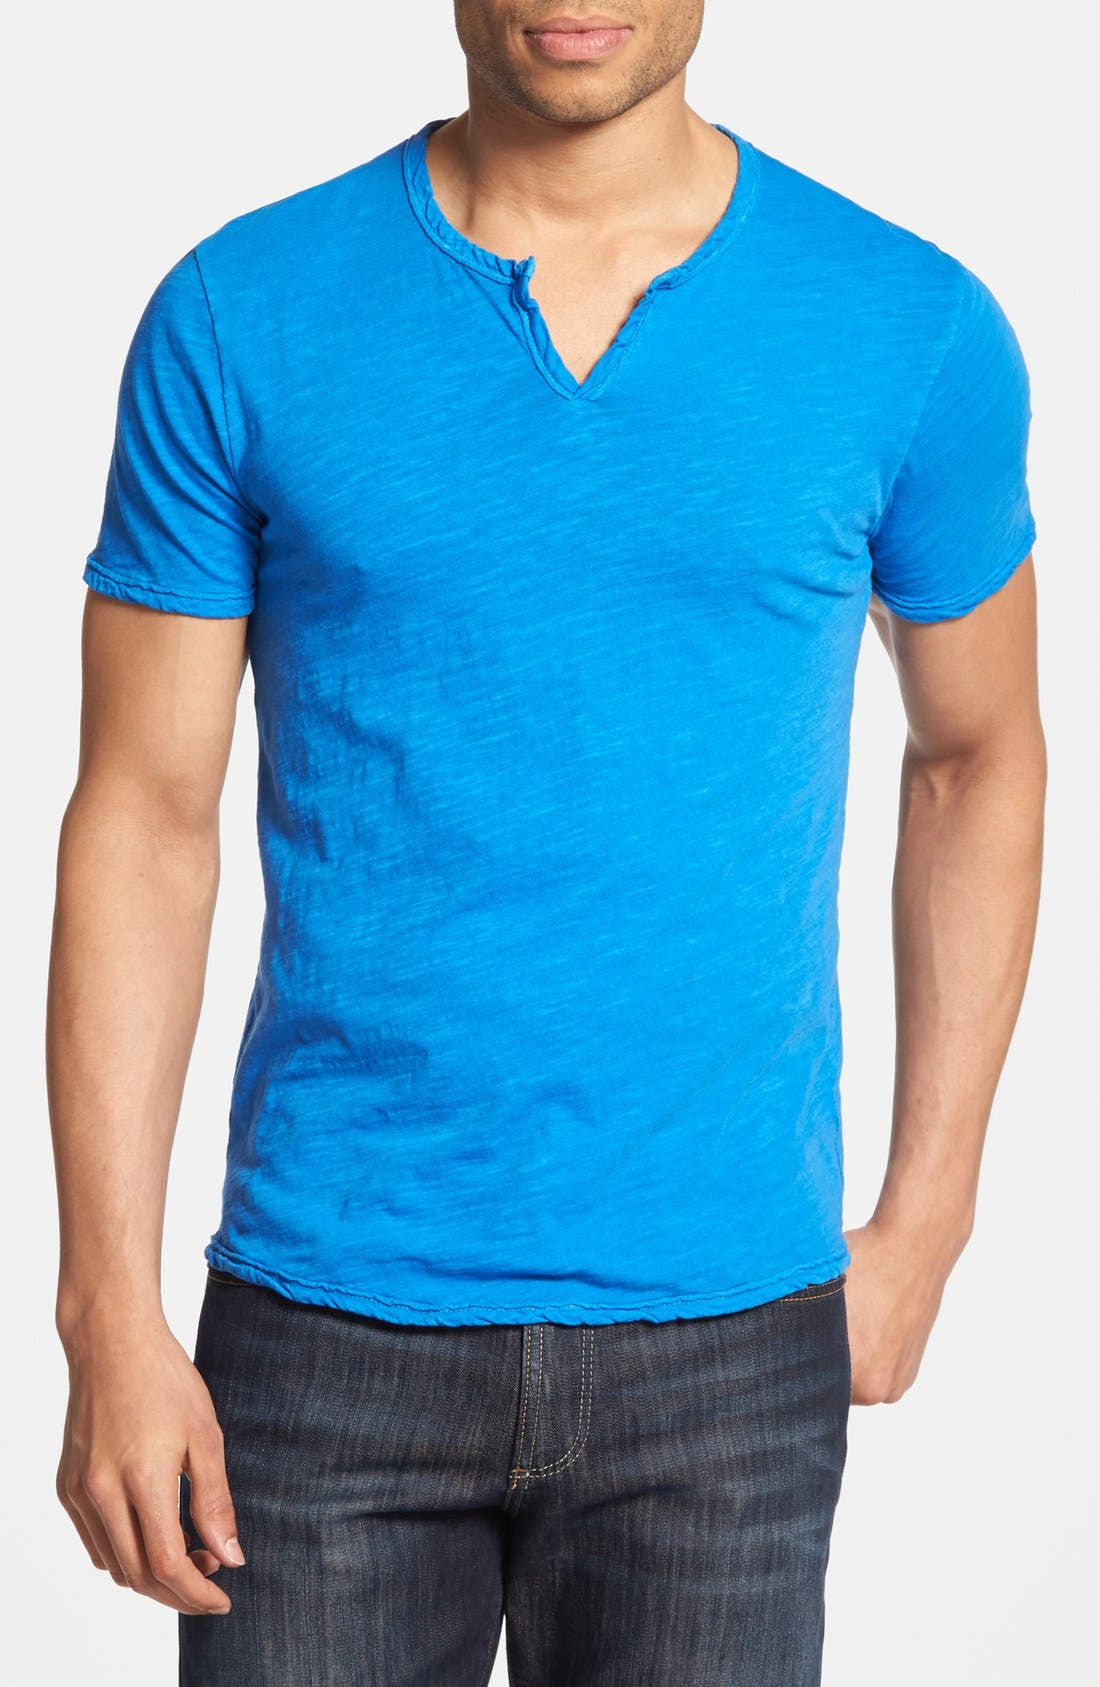 Alternate Image 1 Selected - Lucky Brand Notch Neck T-Shirt